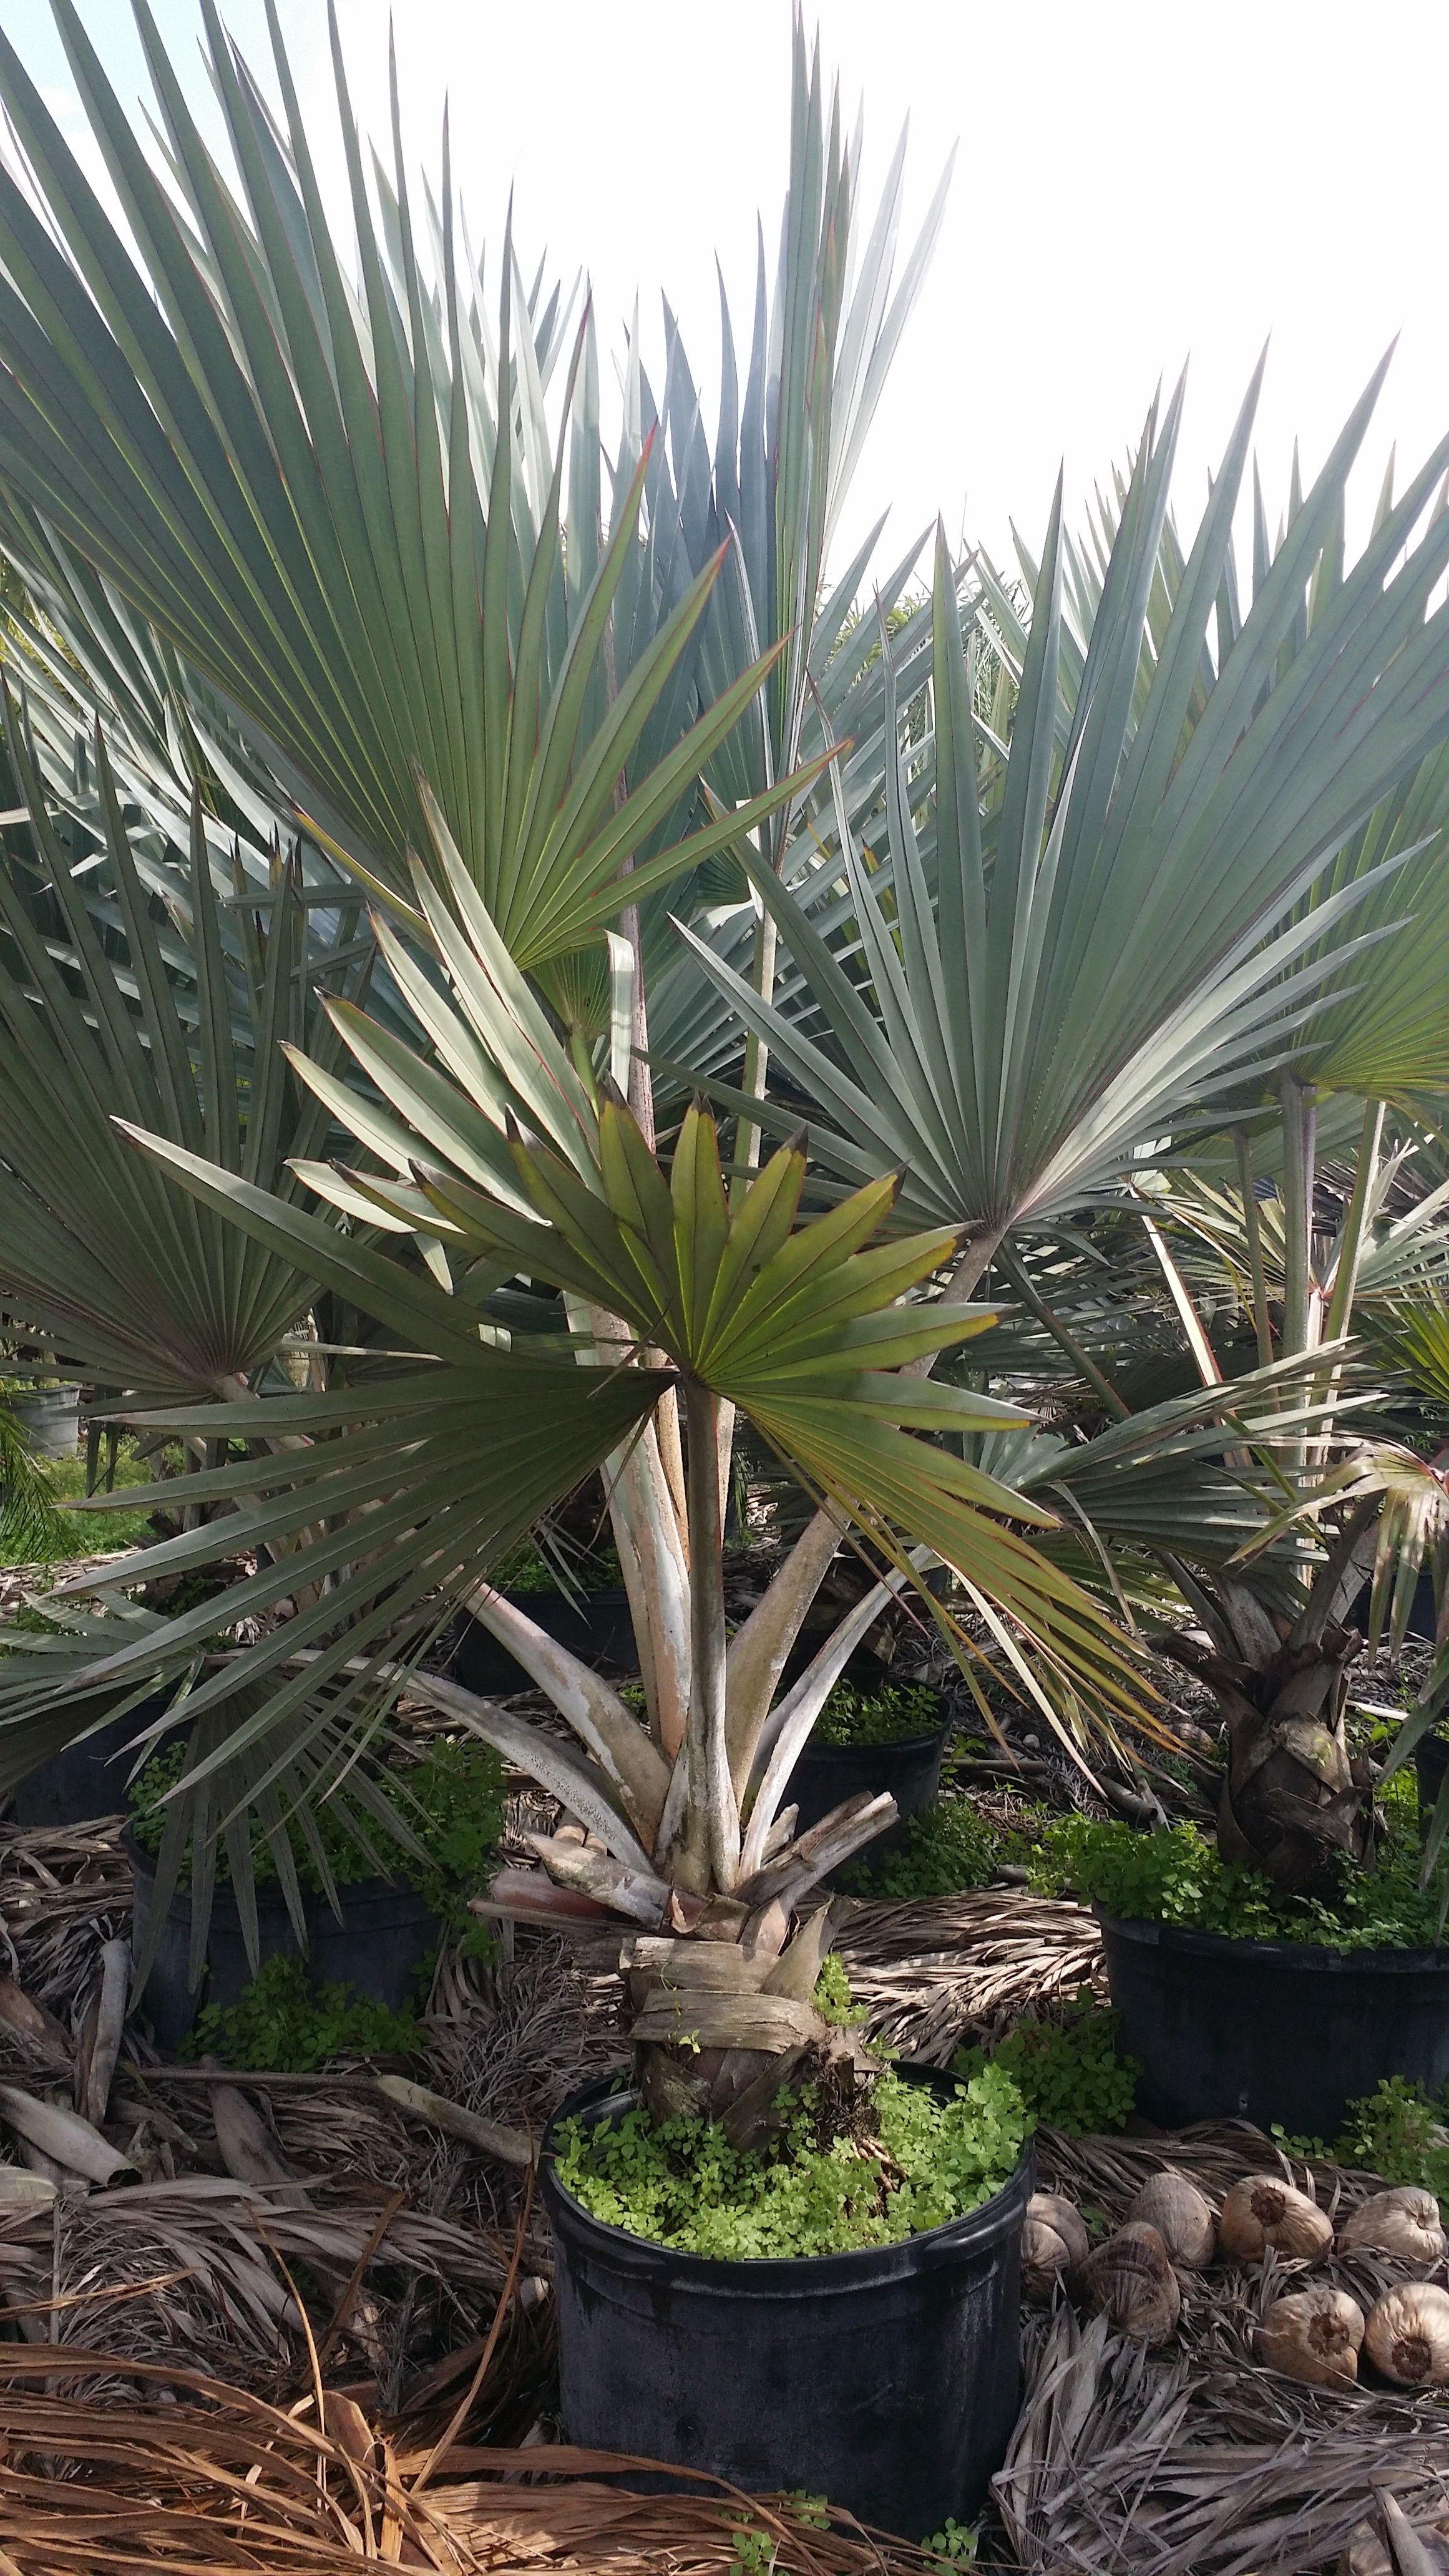 Homestead Rare Palms Nursery Wholesale Palm Trees Blue